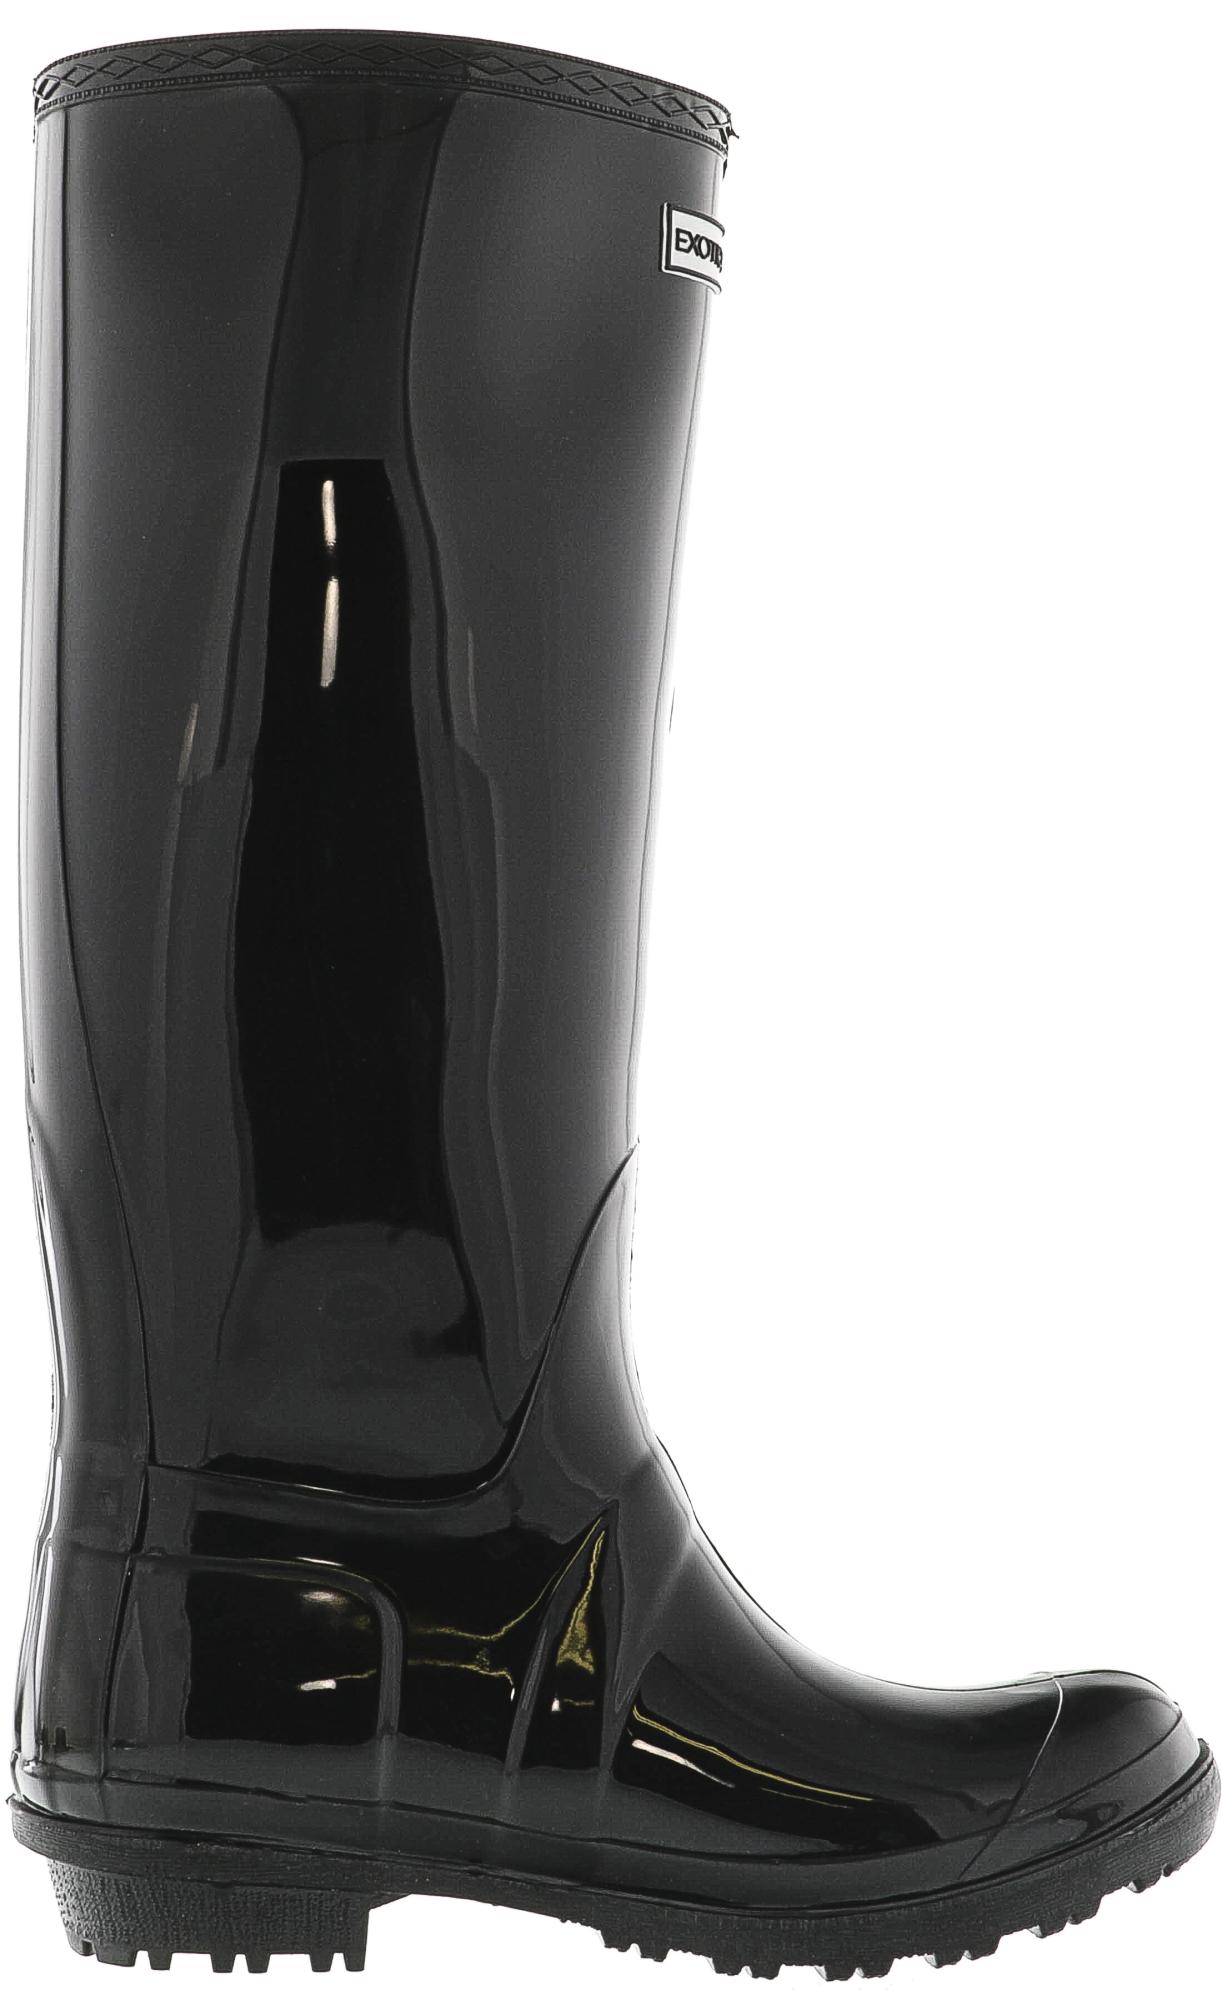 Exotic-Identity-Original-Tall-Rain-Boots-Waterproof-Premium-PVC-Nonslip-So thumbnail 11